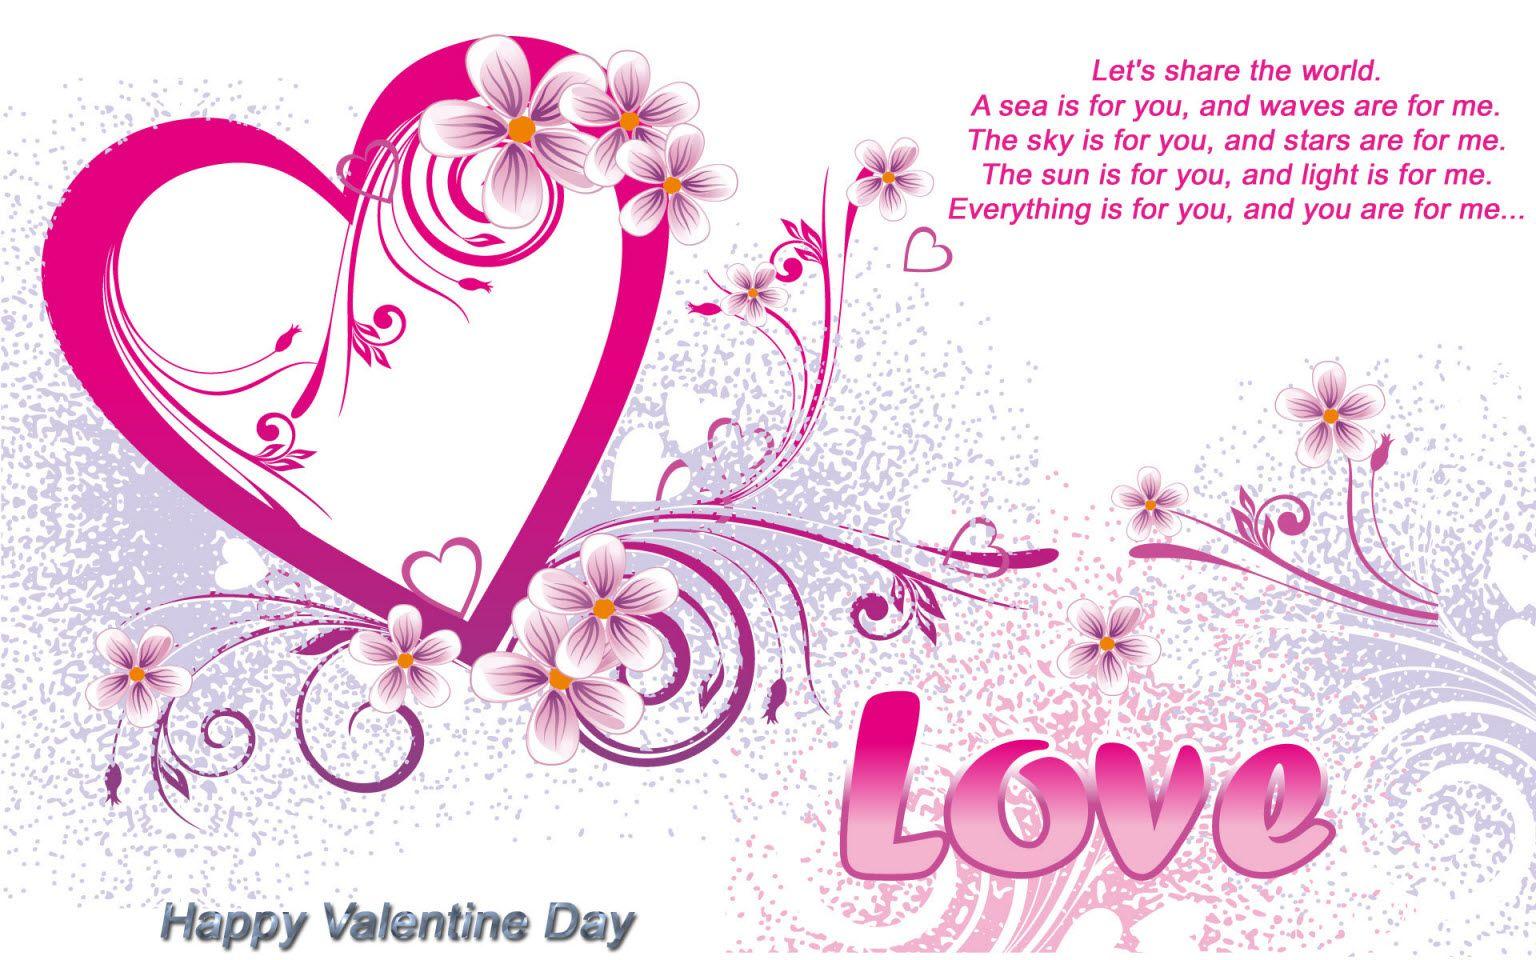 Valentines day, Valentine day cards and Valentines